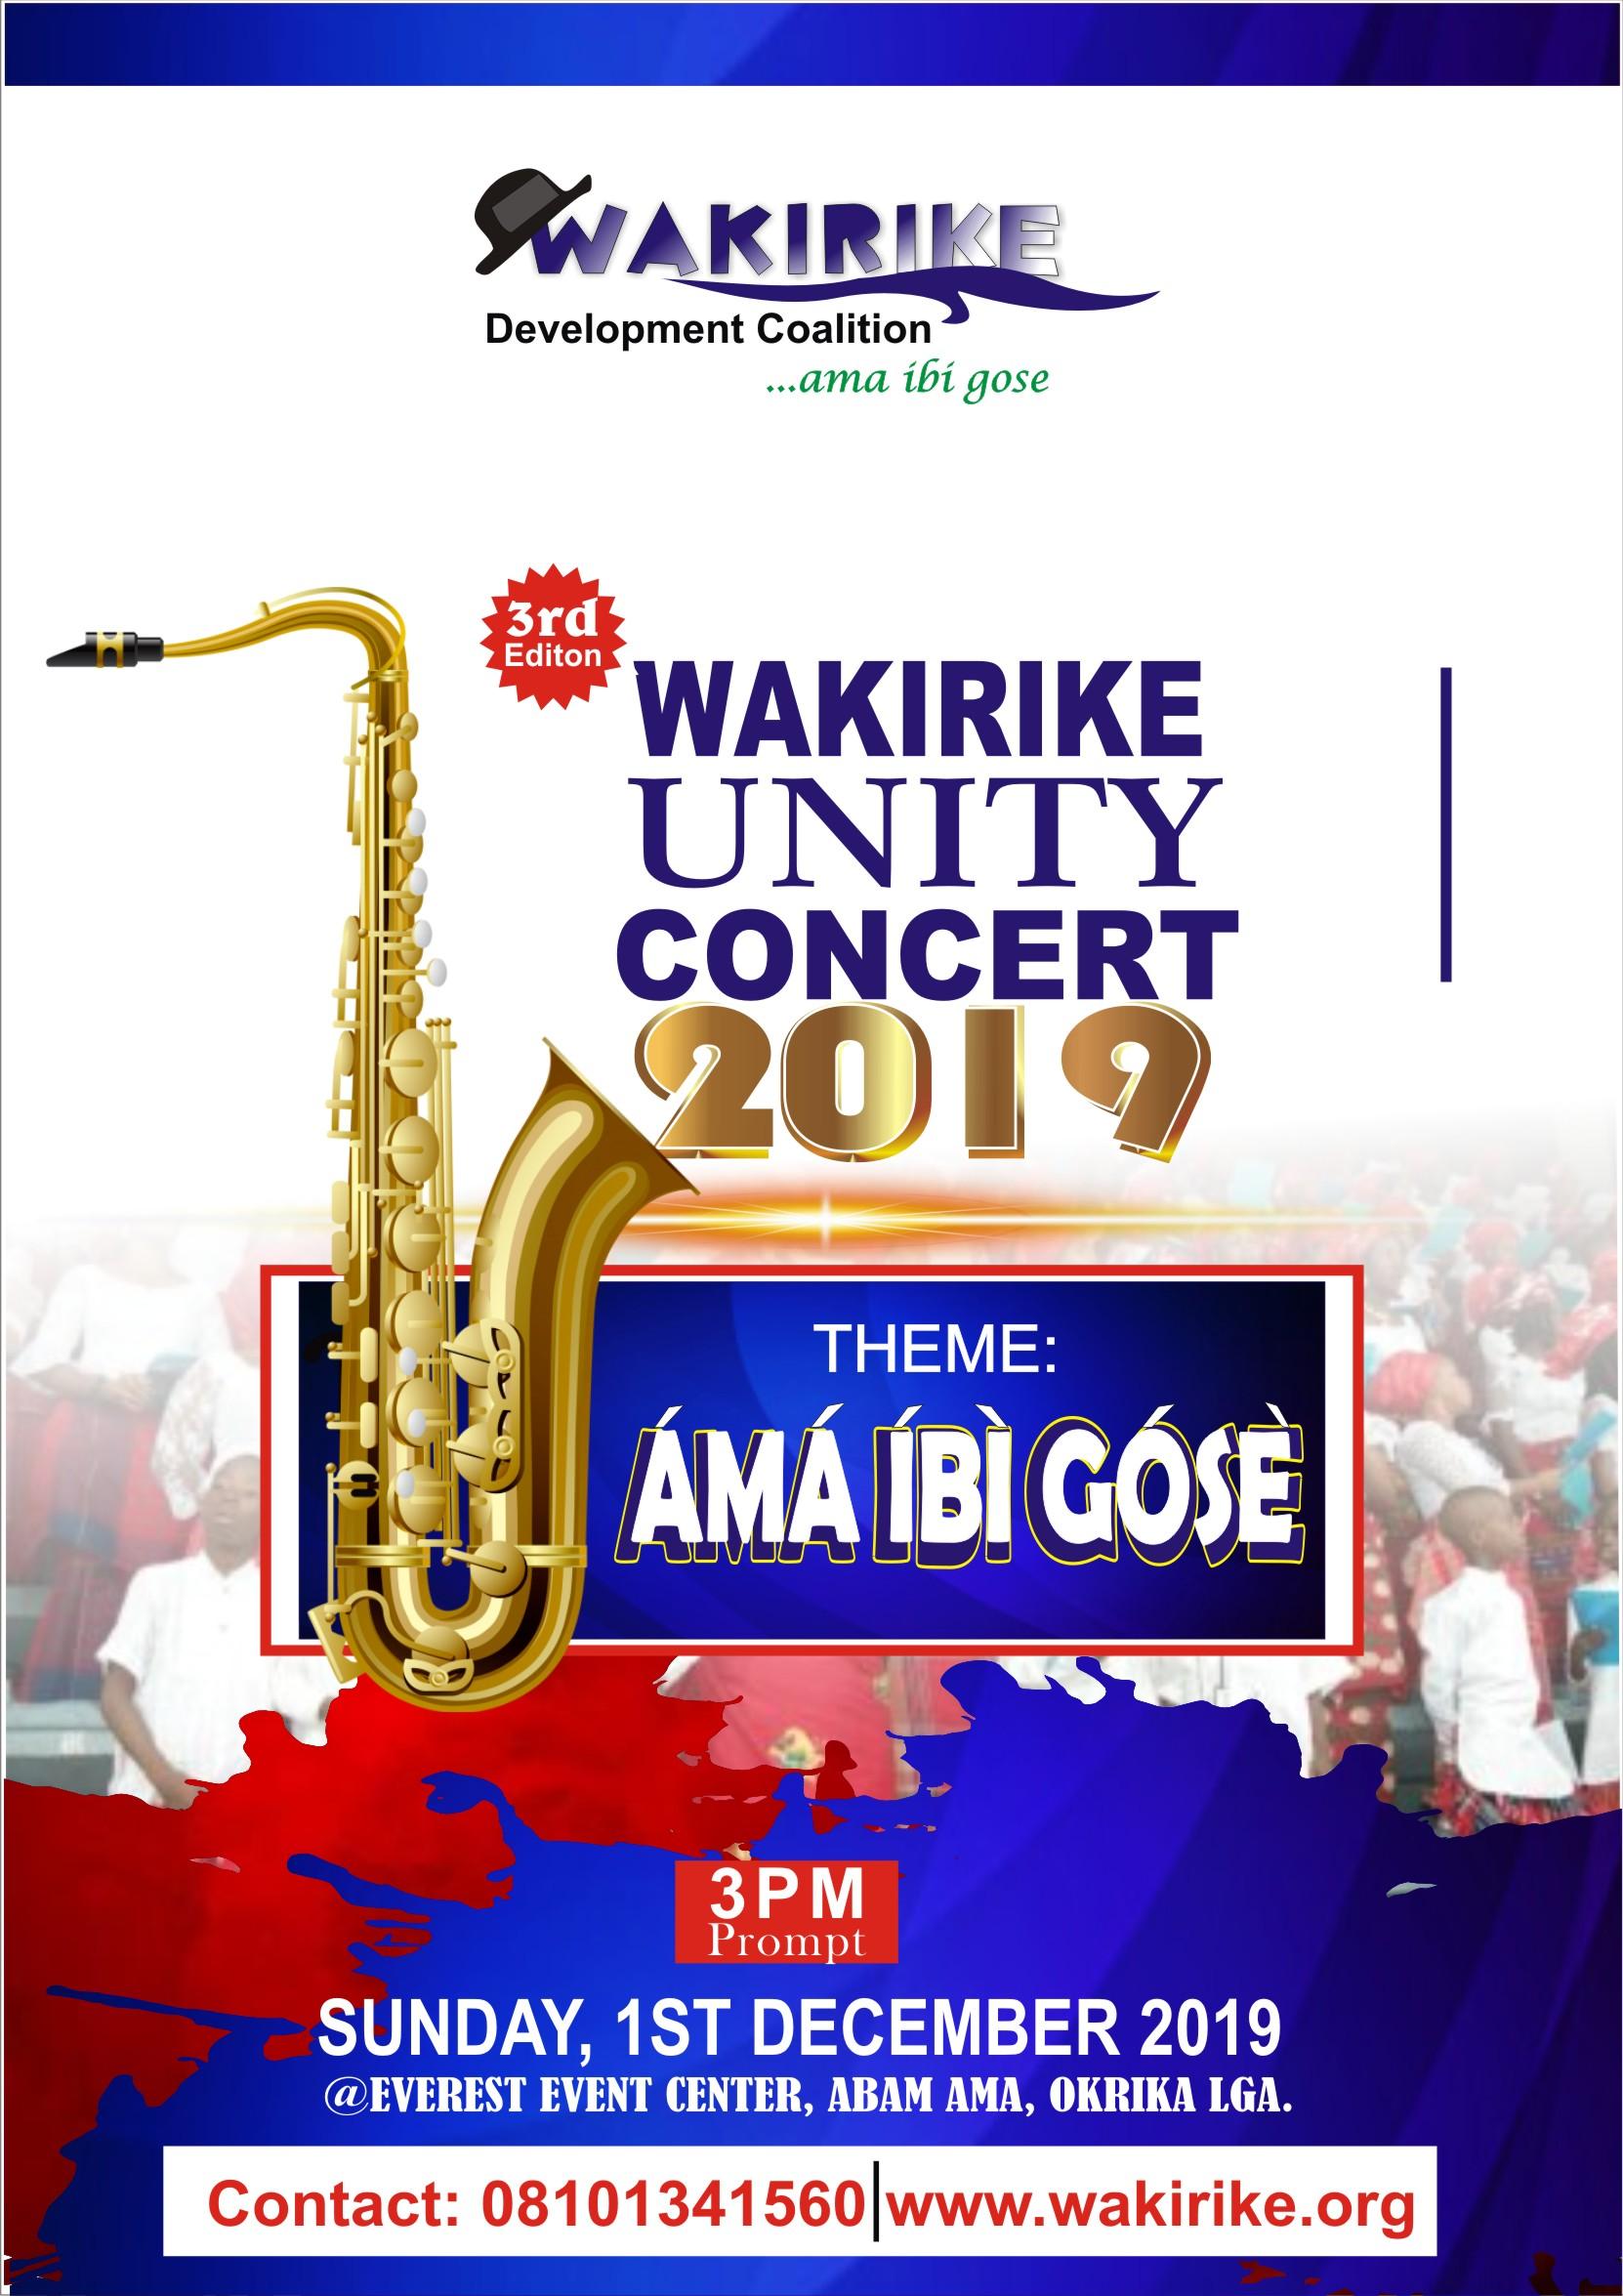 Wakirike Unity Concert 2019